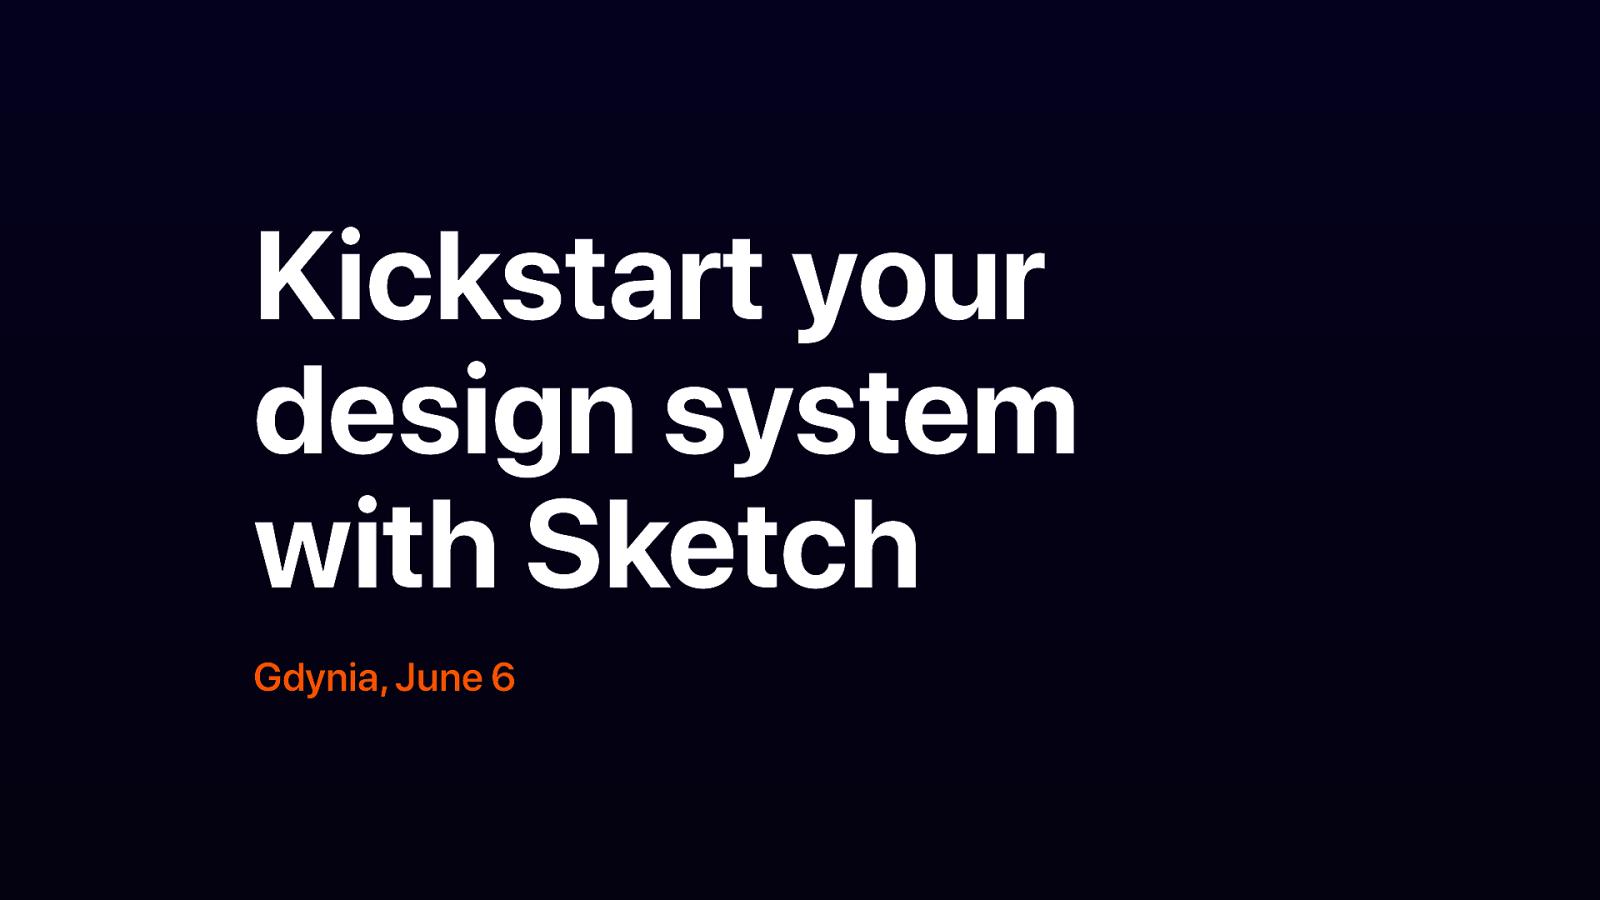 Kickstart your design system with Sketch